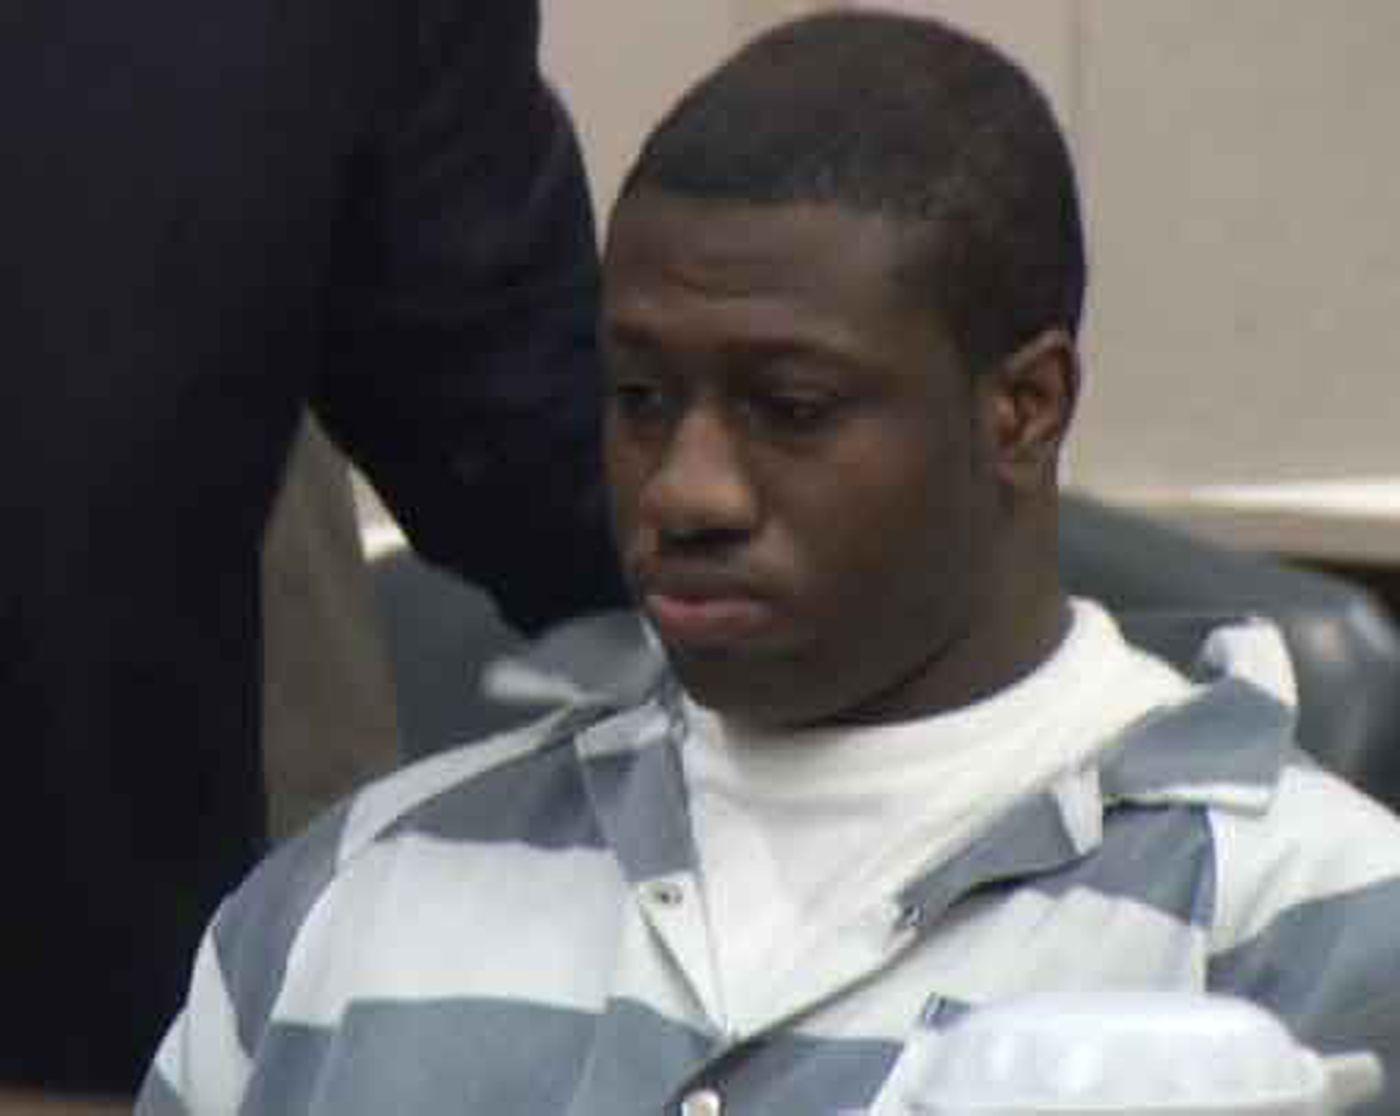 Man Gets Life For Charleston Craigslist Murder Co Defendant Gets 40 Years Craigslist top ranking cities list. man gets life for charleston craigslist